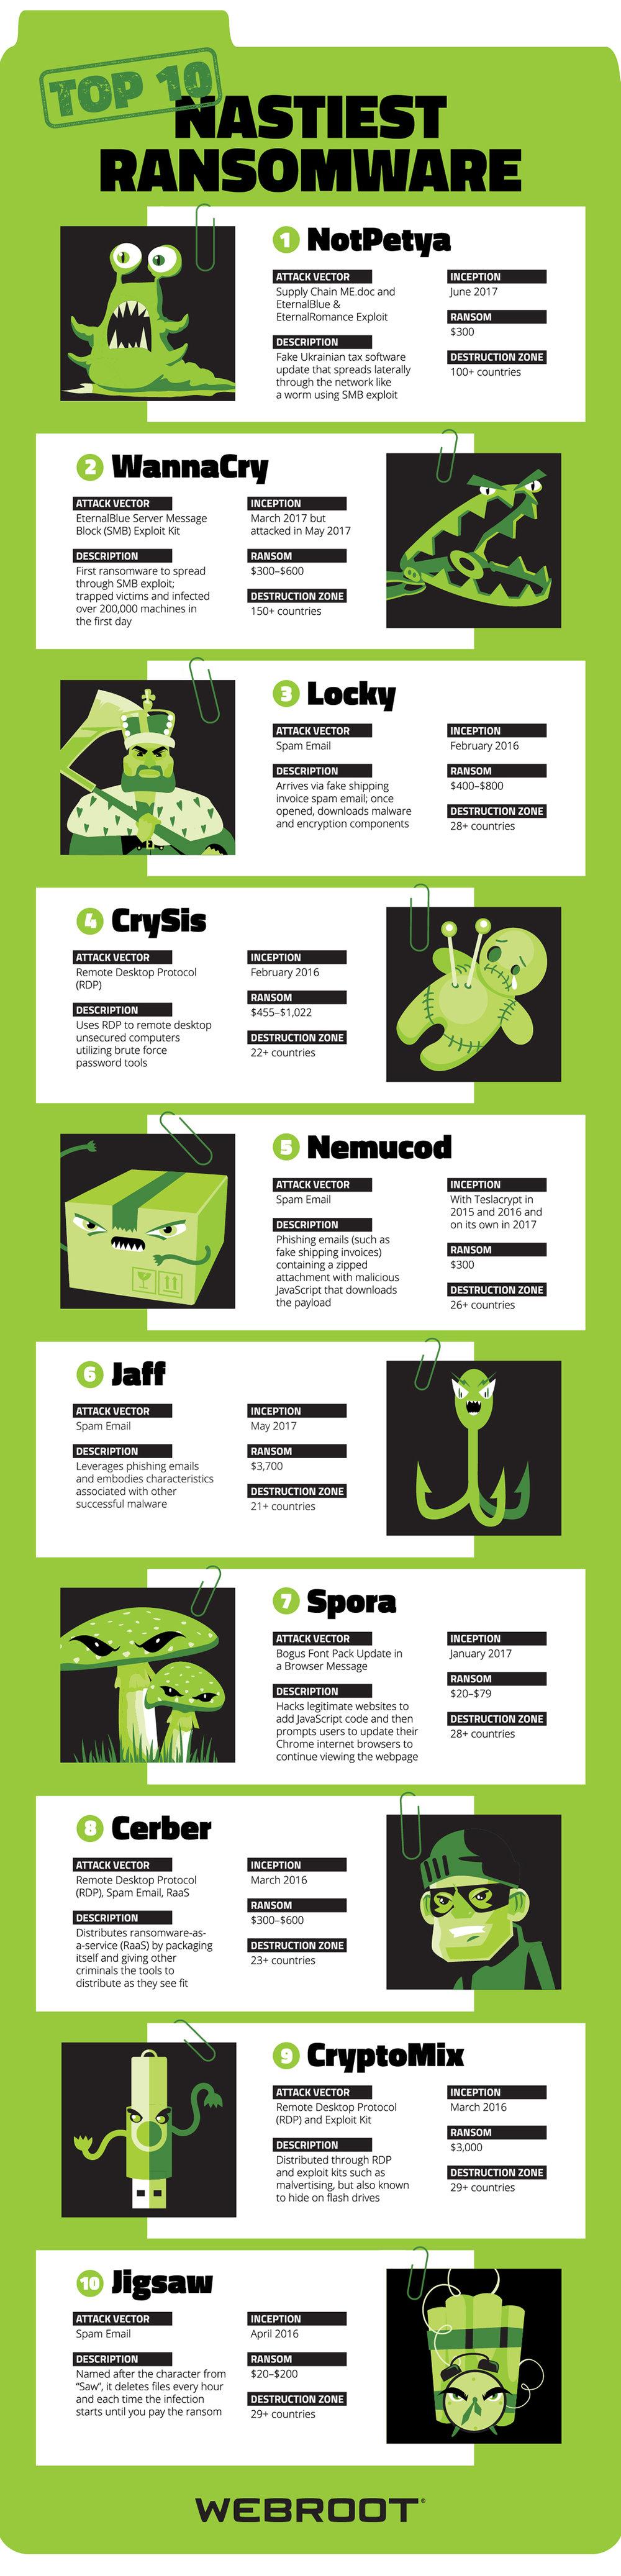 Top-10-Nastiest-Ransomware-Infographic_sm-01.jpg